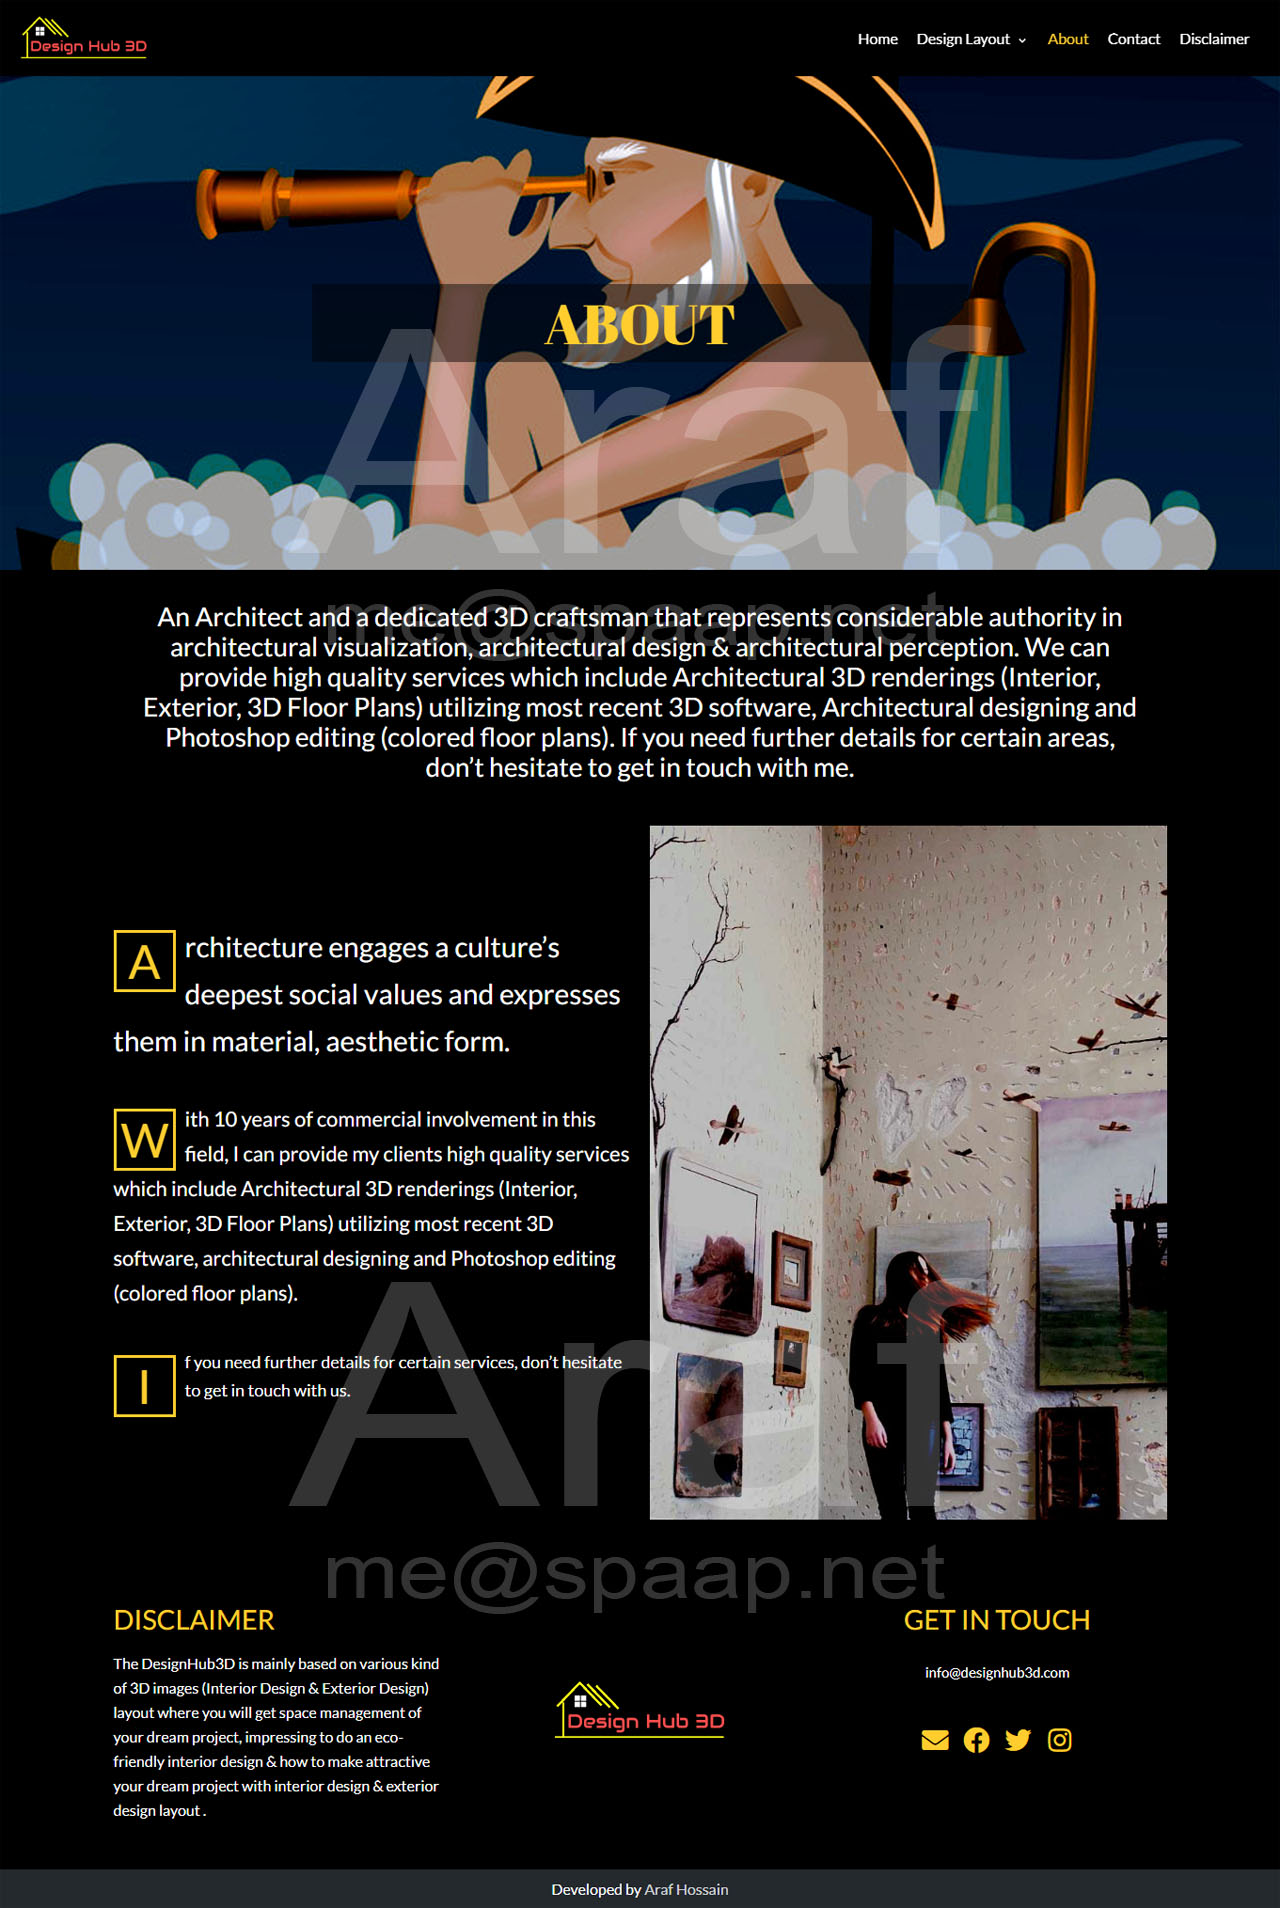 Araf Hossain - DesignHub 3D About